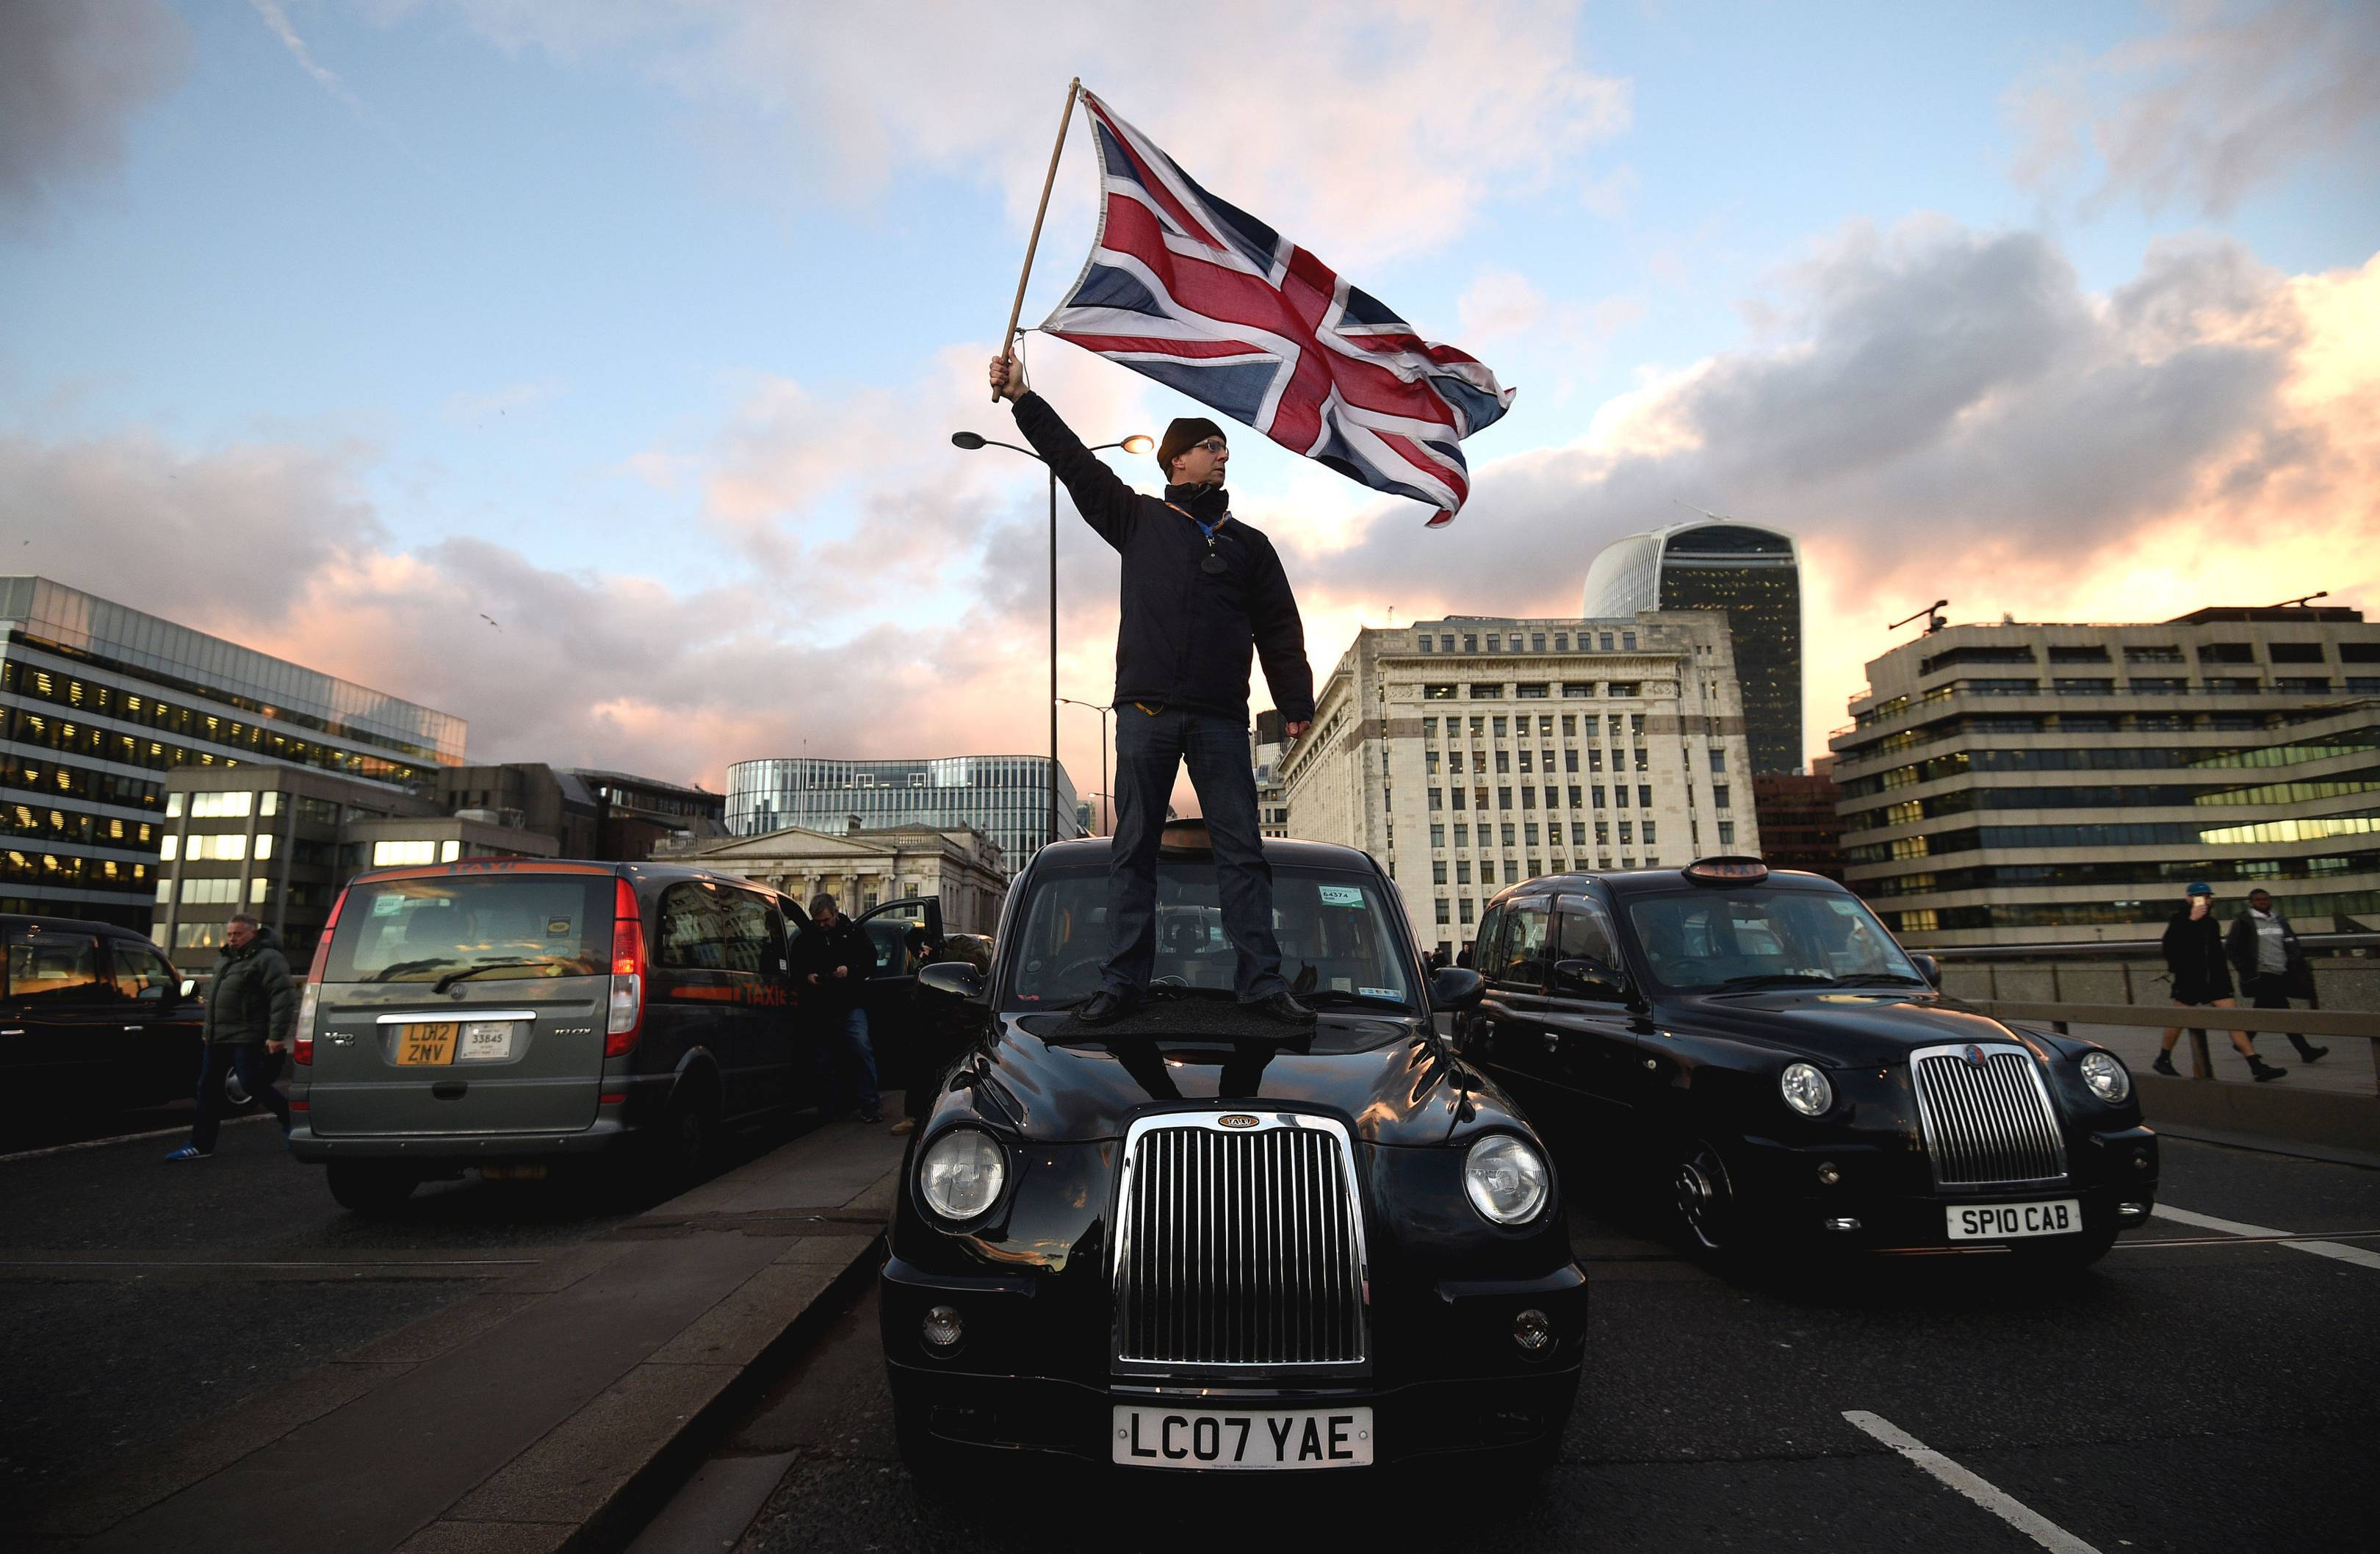 Like the gilets jaunes, London's black-cab and Uber drivers